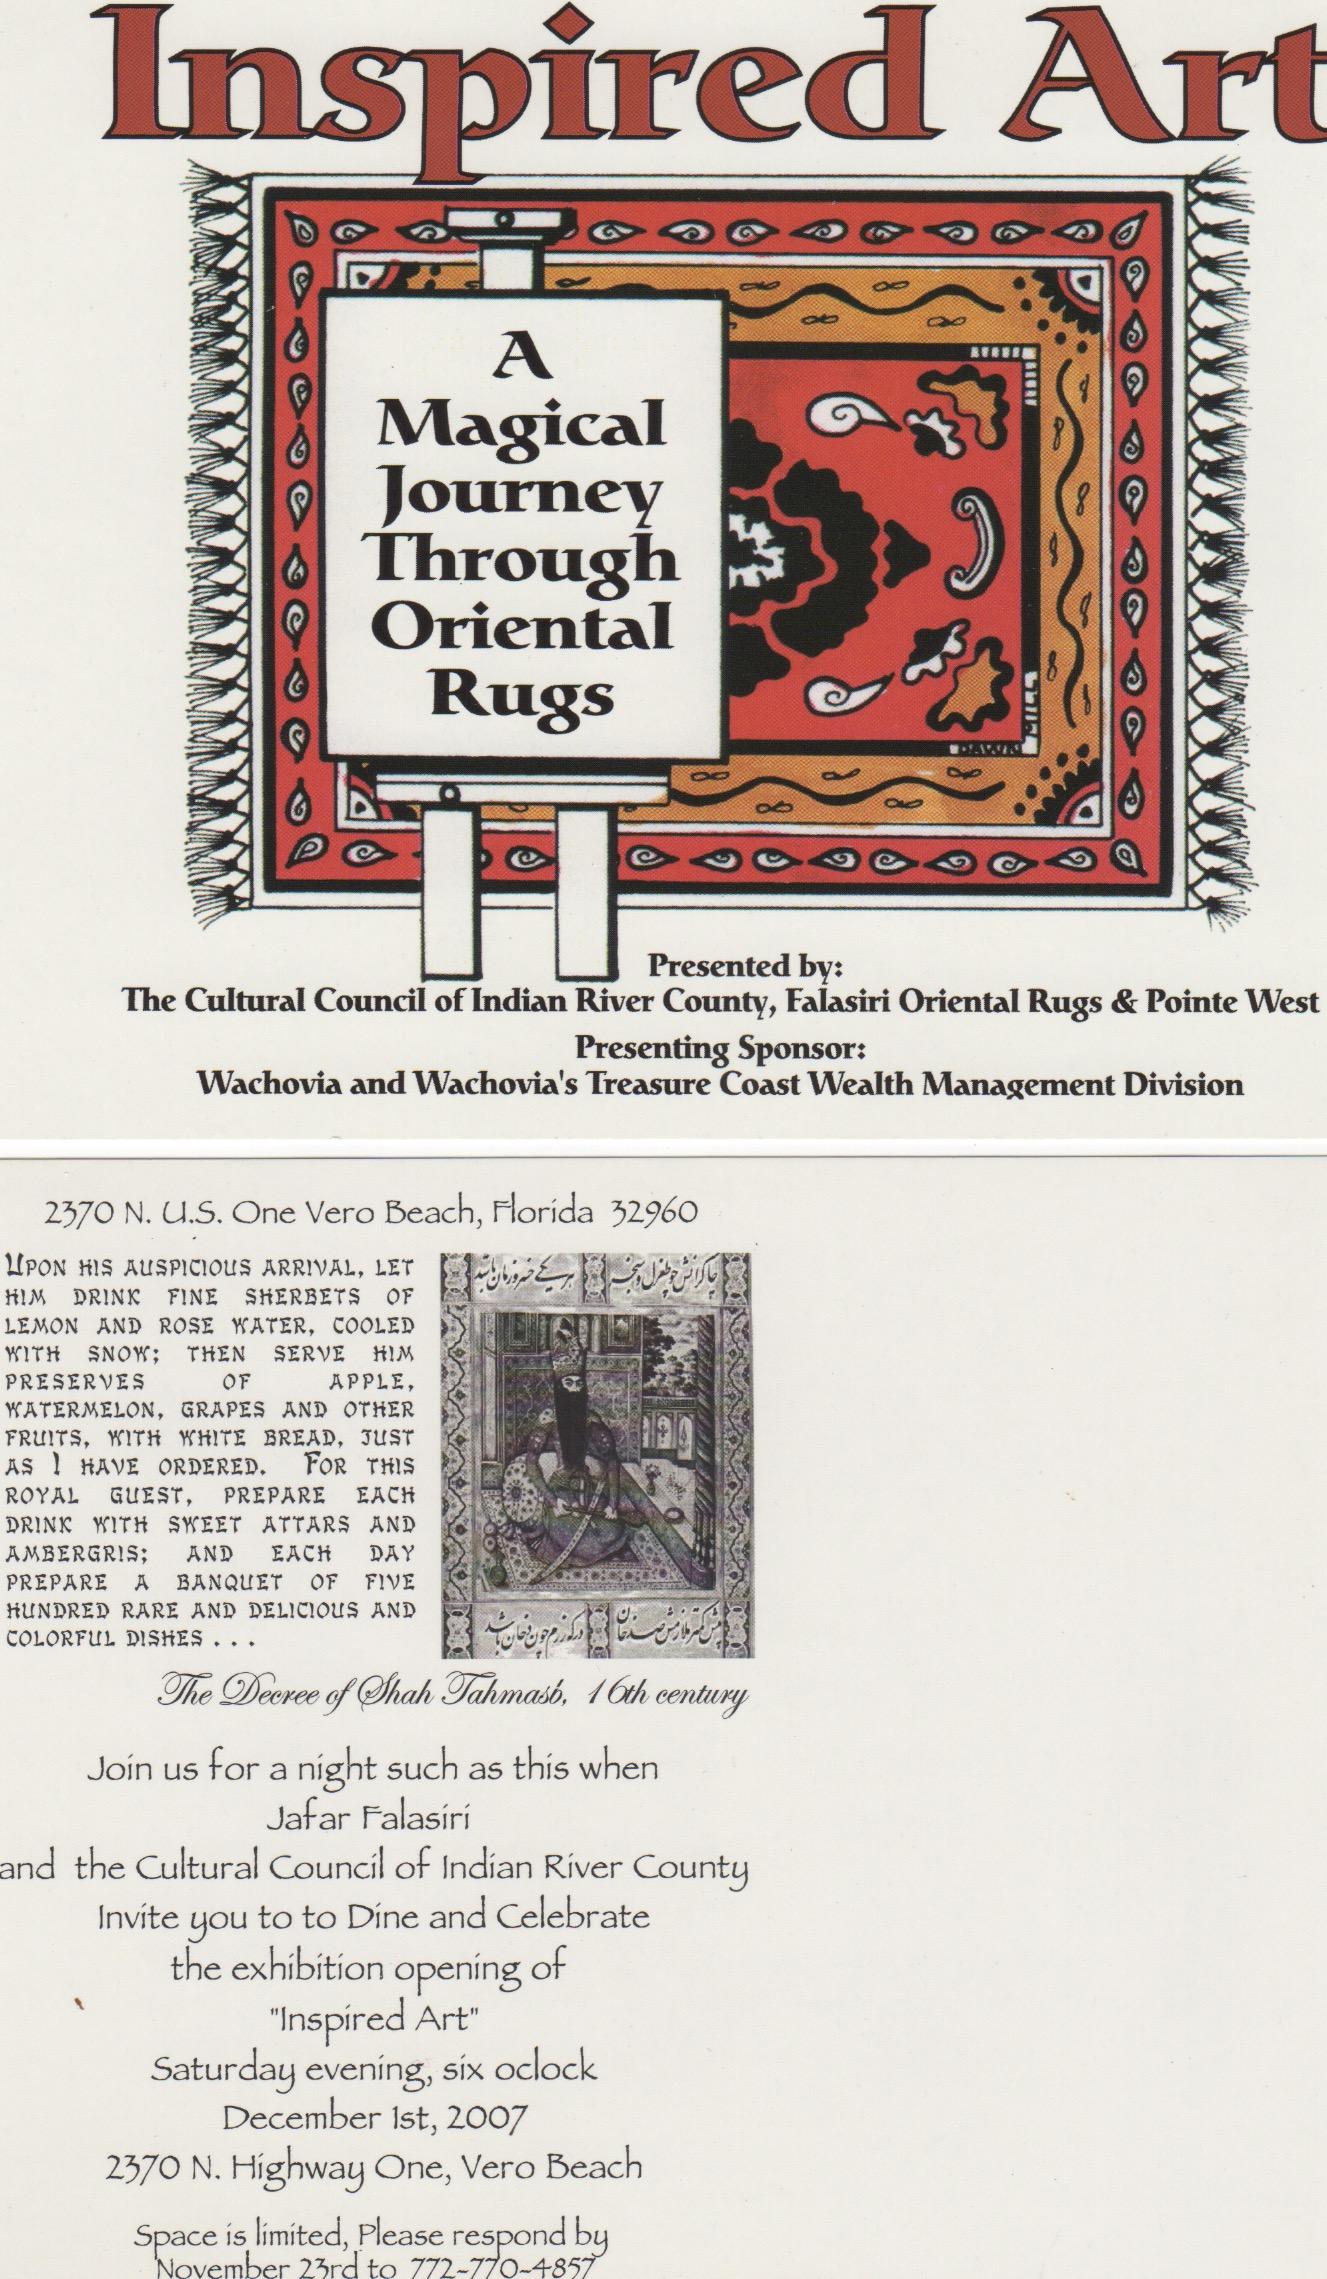 Cultural Council_A Magical Journey through oriental rugs_Pg 10.jpeg